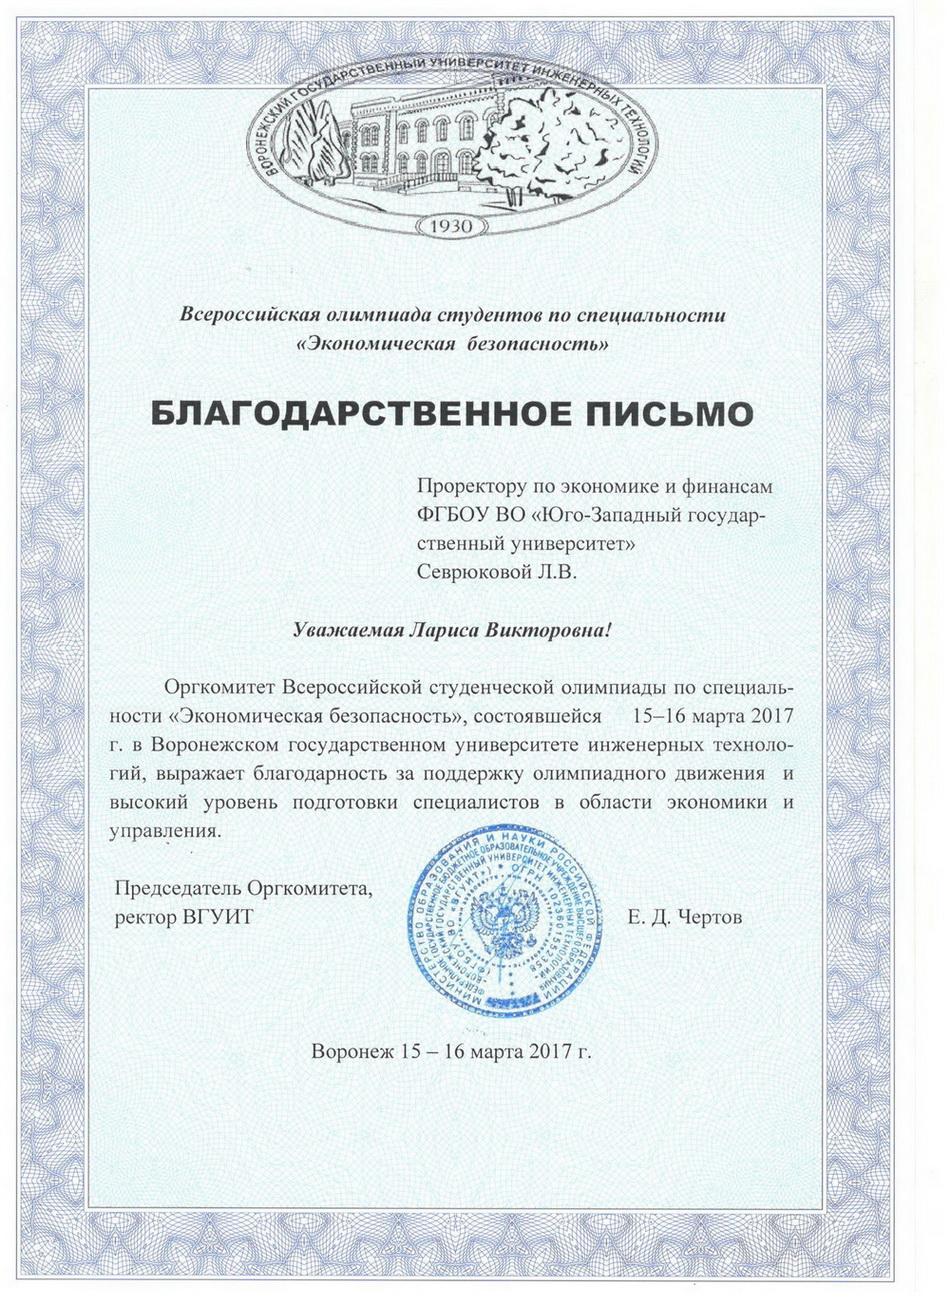 Достижения Севрюкова Лариса Викторовна прошла обучение на семинаре по теме Экономика и финансирование предприятий и организаций получила сертификат